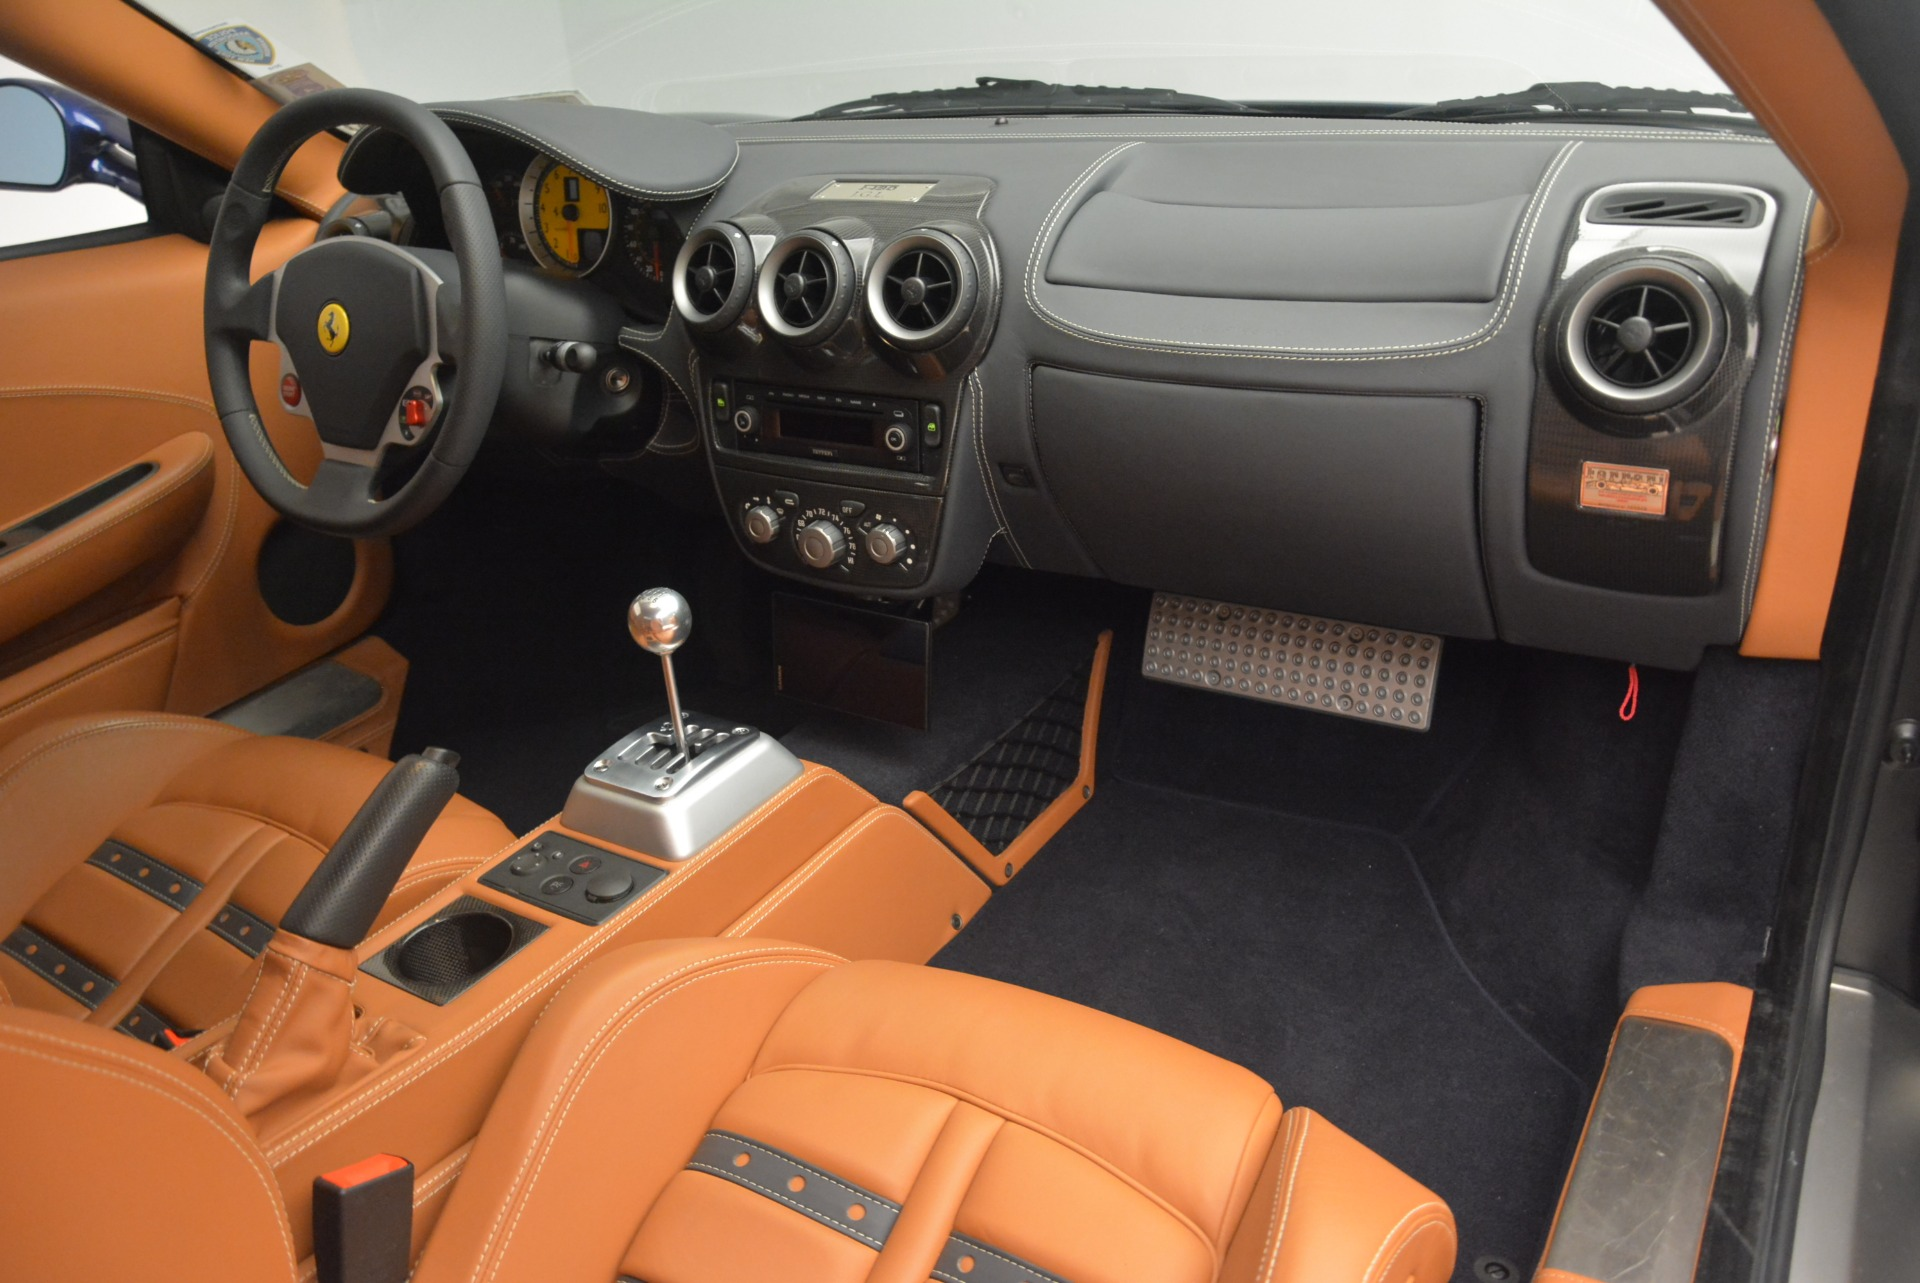 Used 2009 Ferrari F430 6-Speed Manual For Sale In Westport, CT 2466_p18